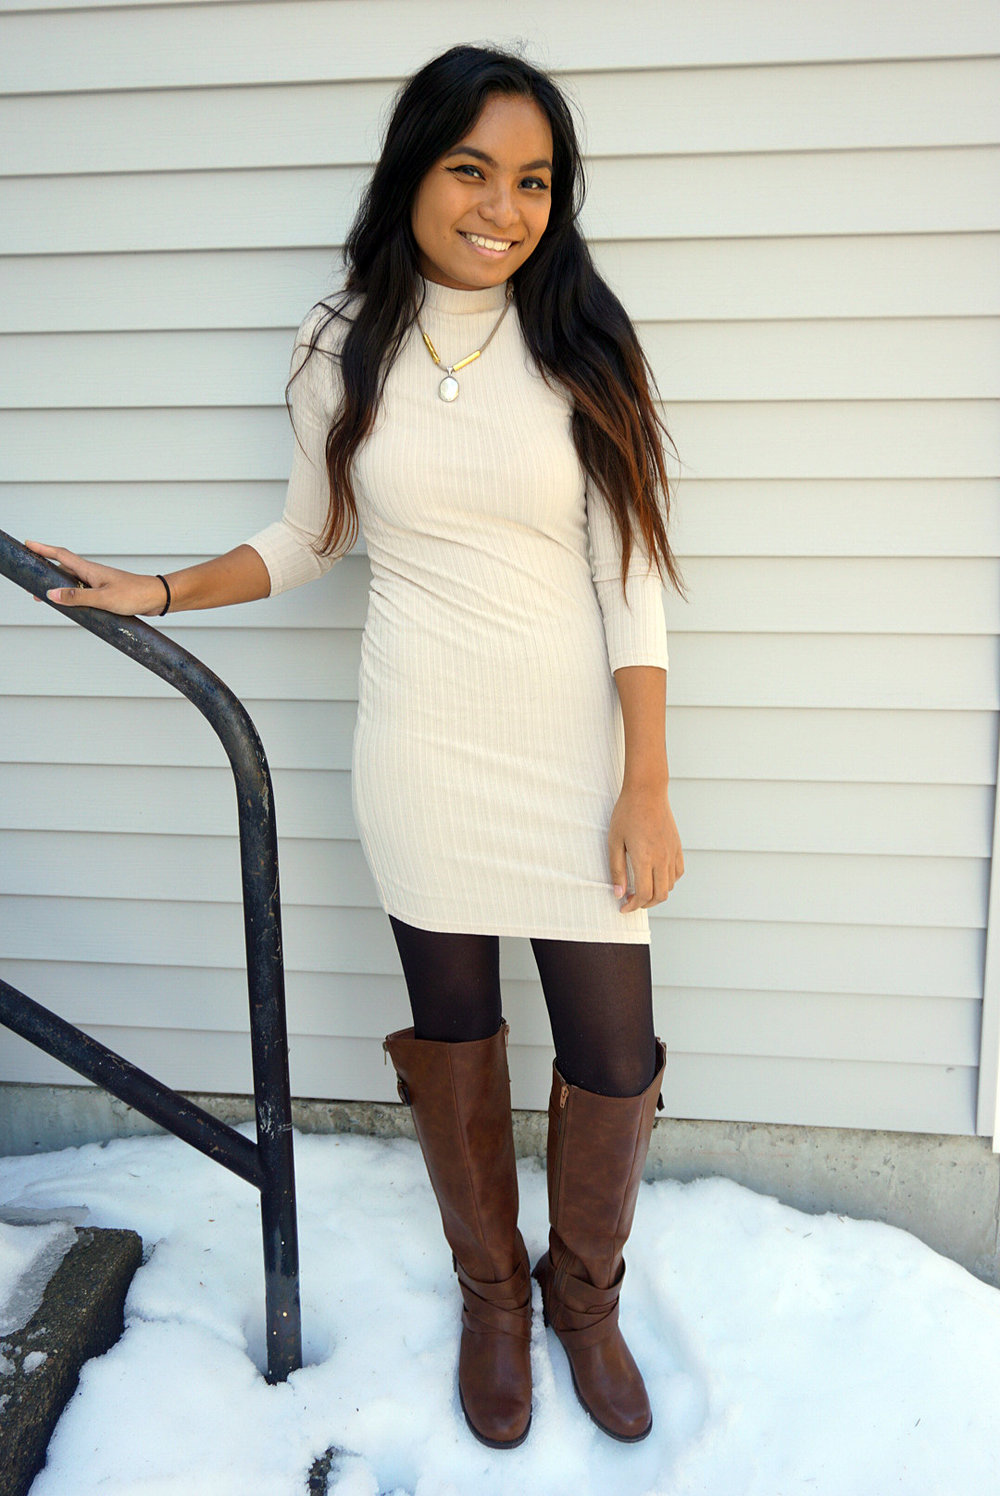 White-Dress-Caramel-Cardigan-Transitioning-To-Spring-Fashionista-Blogger-Style-LINDATENCHITRAN-9-1080x1616.jpg